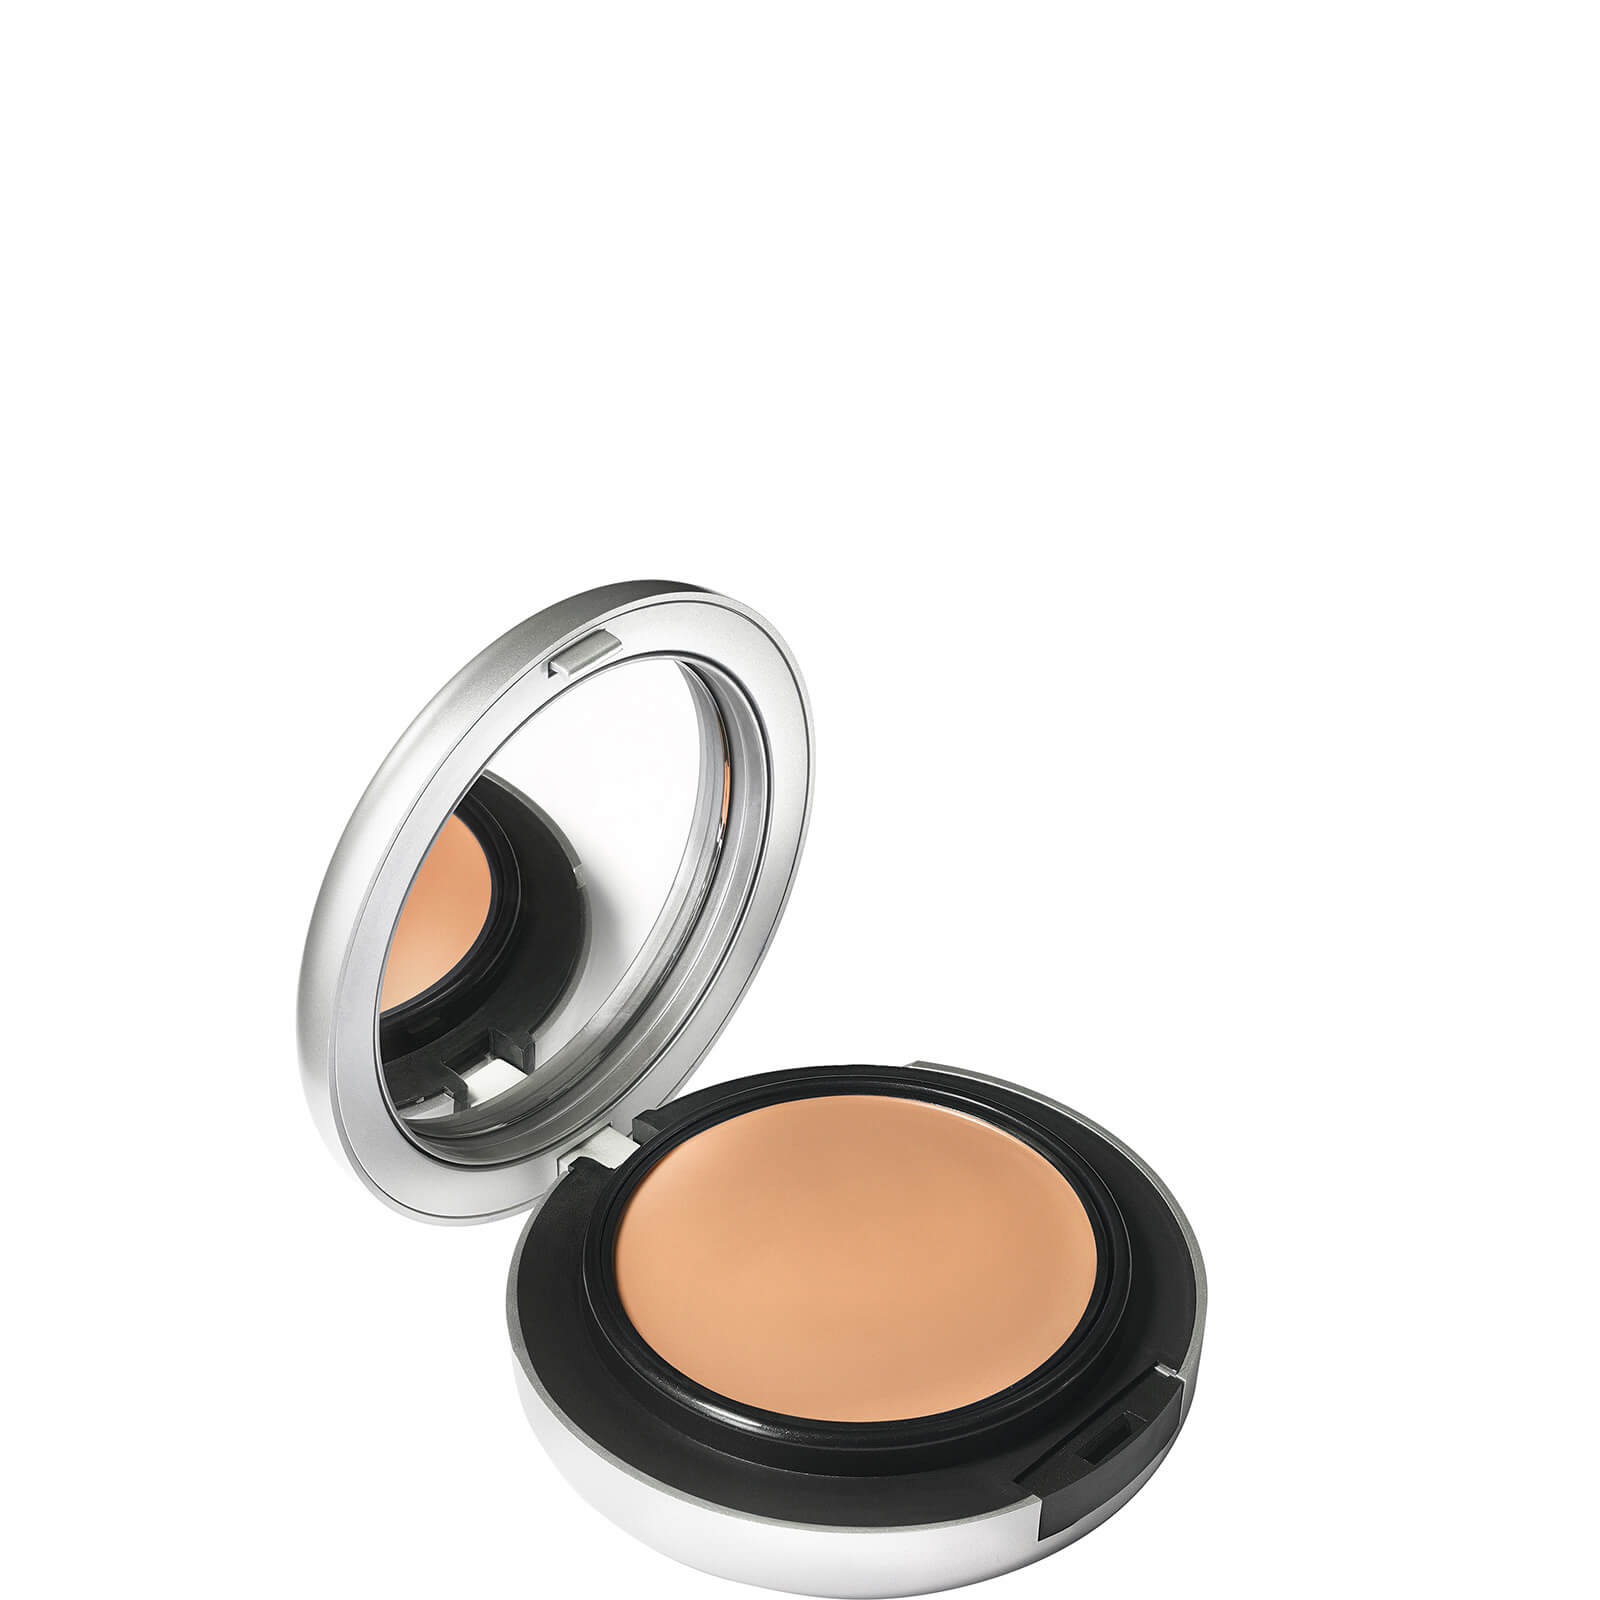 MAC Studio Fix Tech Cream-to-Powder Foundation 10g (Various Shades) - NW13